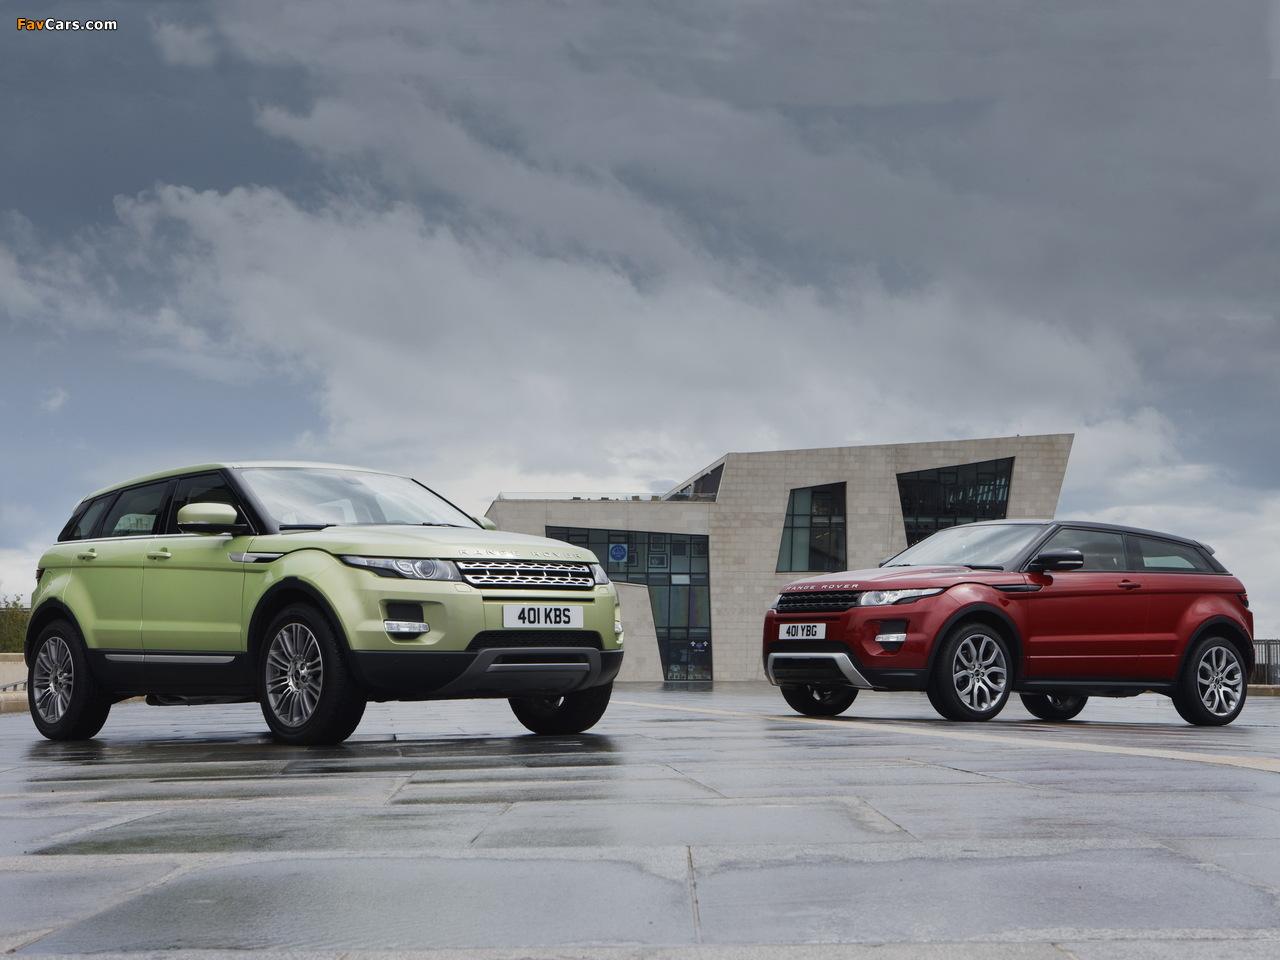 Land Rover Range Rover Evoque images (1280 x 960)